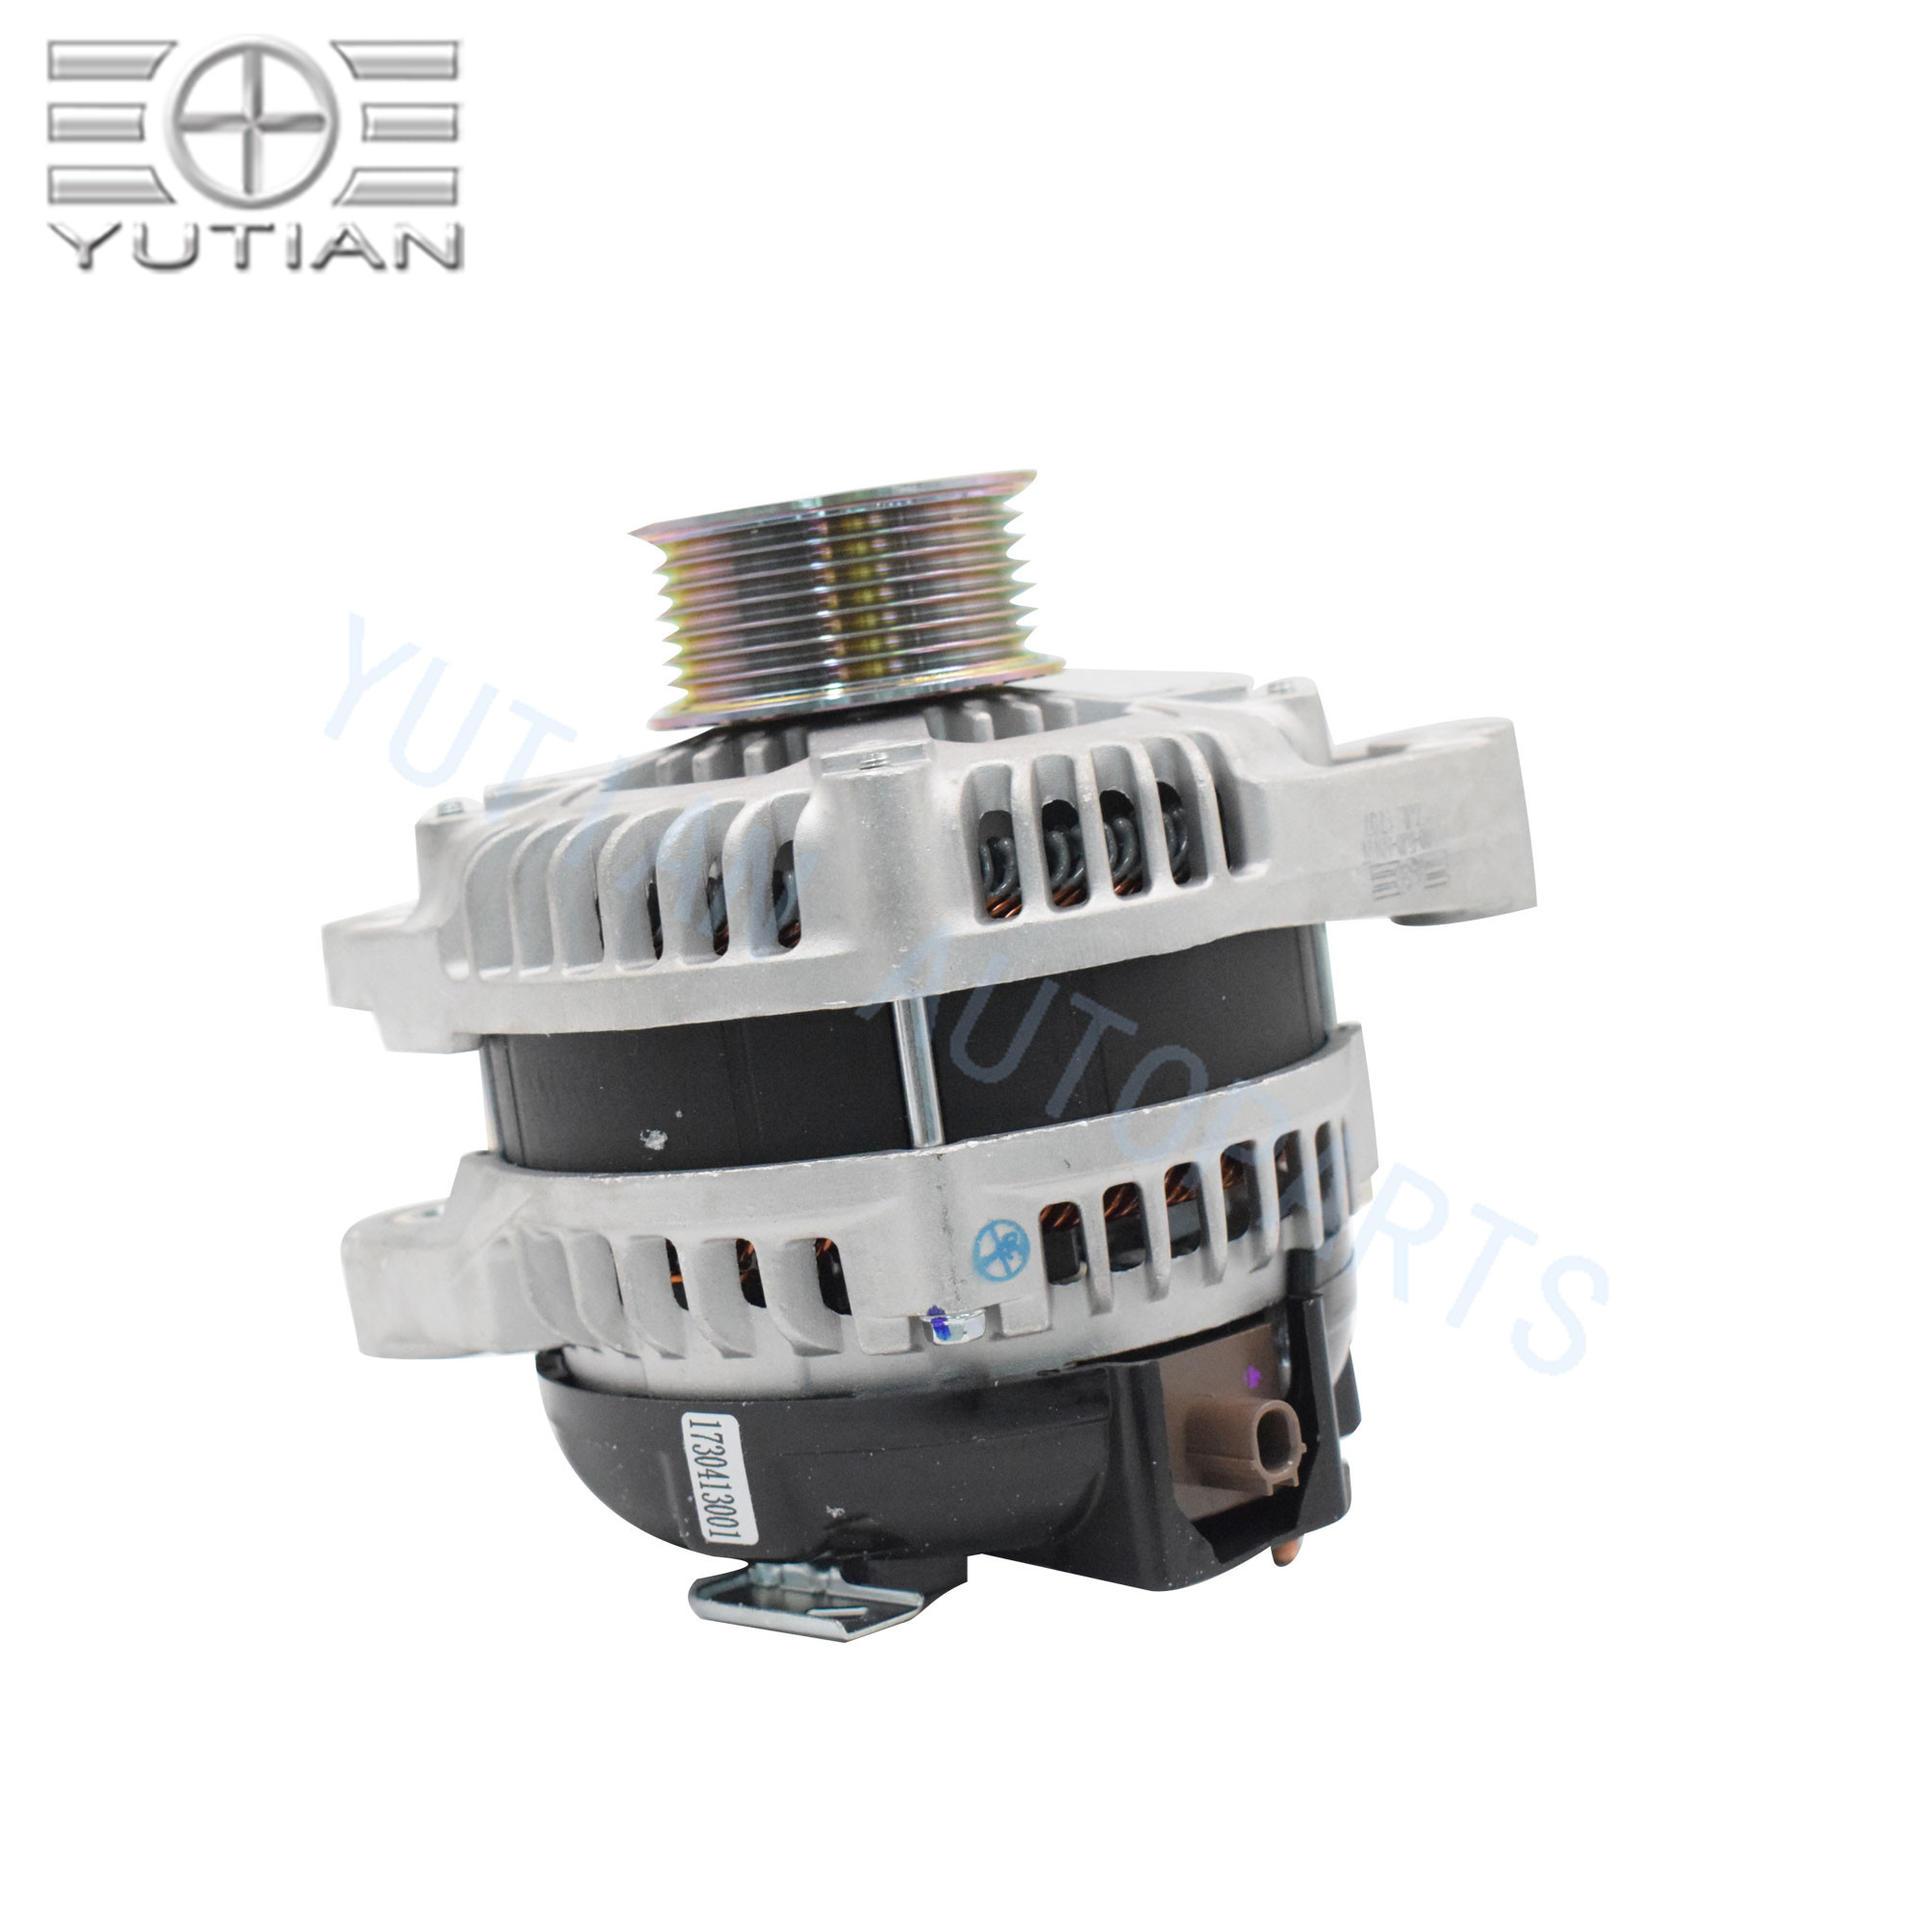 For Honda Alternator Odyssey 2015-2018  2.4L Car generator 14V 130A 7PK OEM 31100-5J0-A01